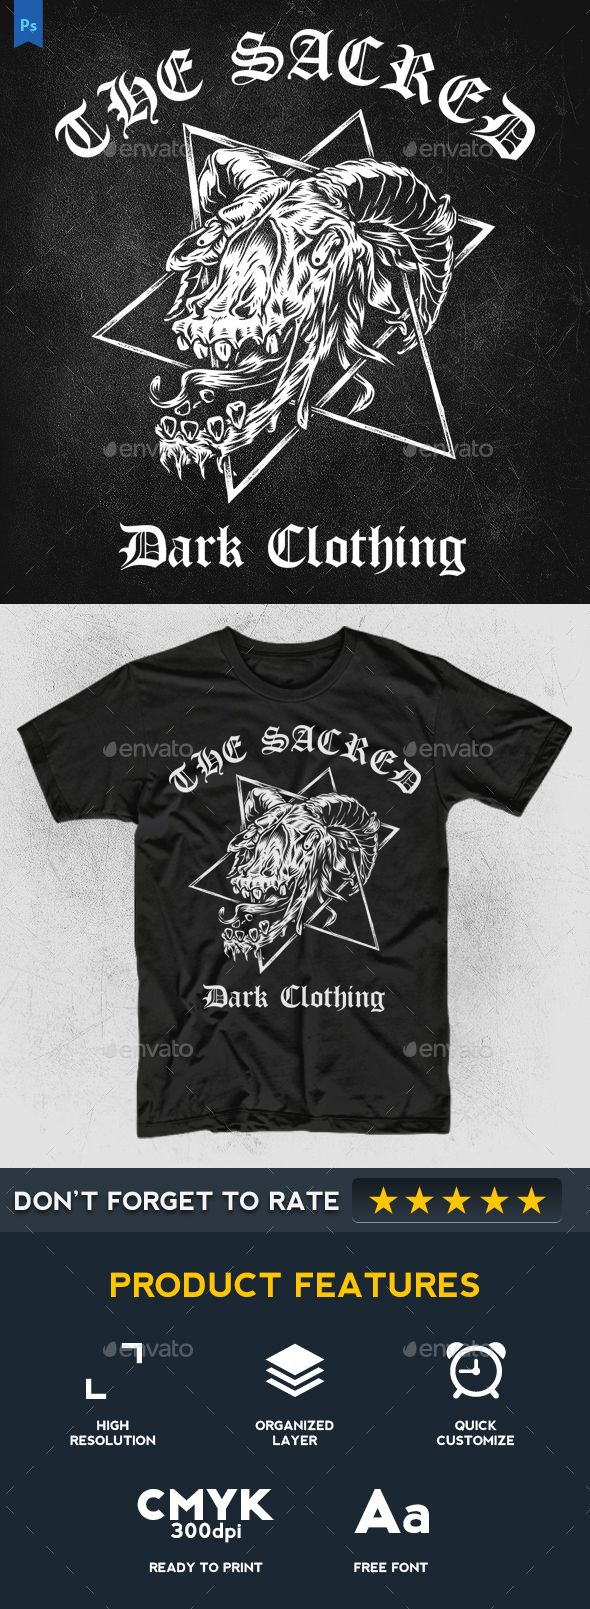 The Sacred - Grunge Designs  #t-shirt #template #maze #vintage #design #clothing #apparel #ornament #tattoo #inked #mockup #goat #blackmetal #grind #metal #music #merch # death #dark #emo #halloween